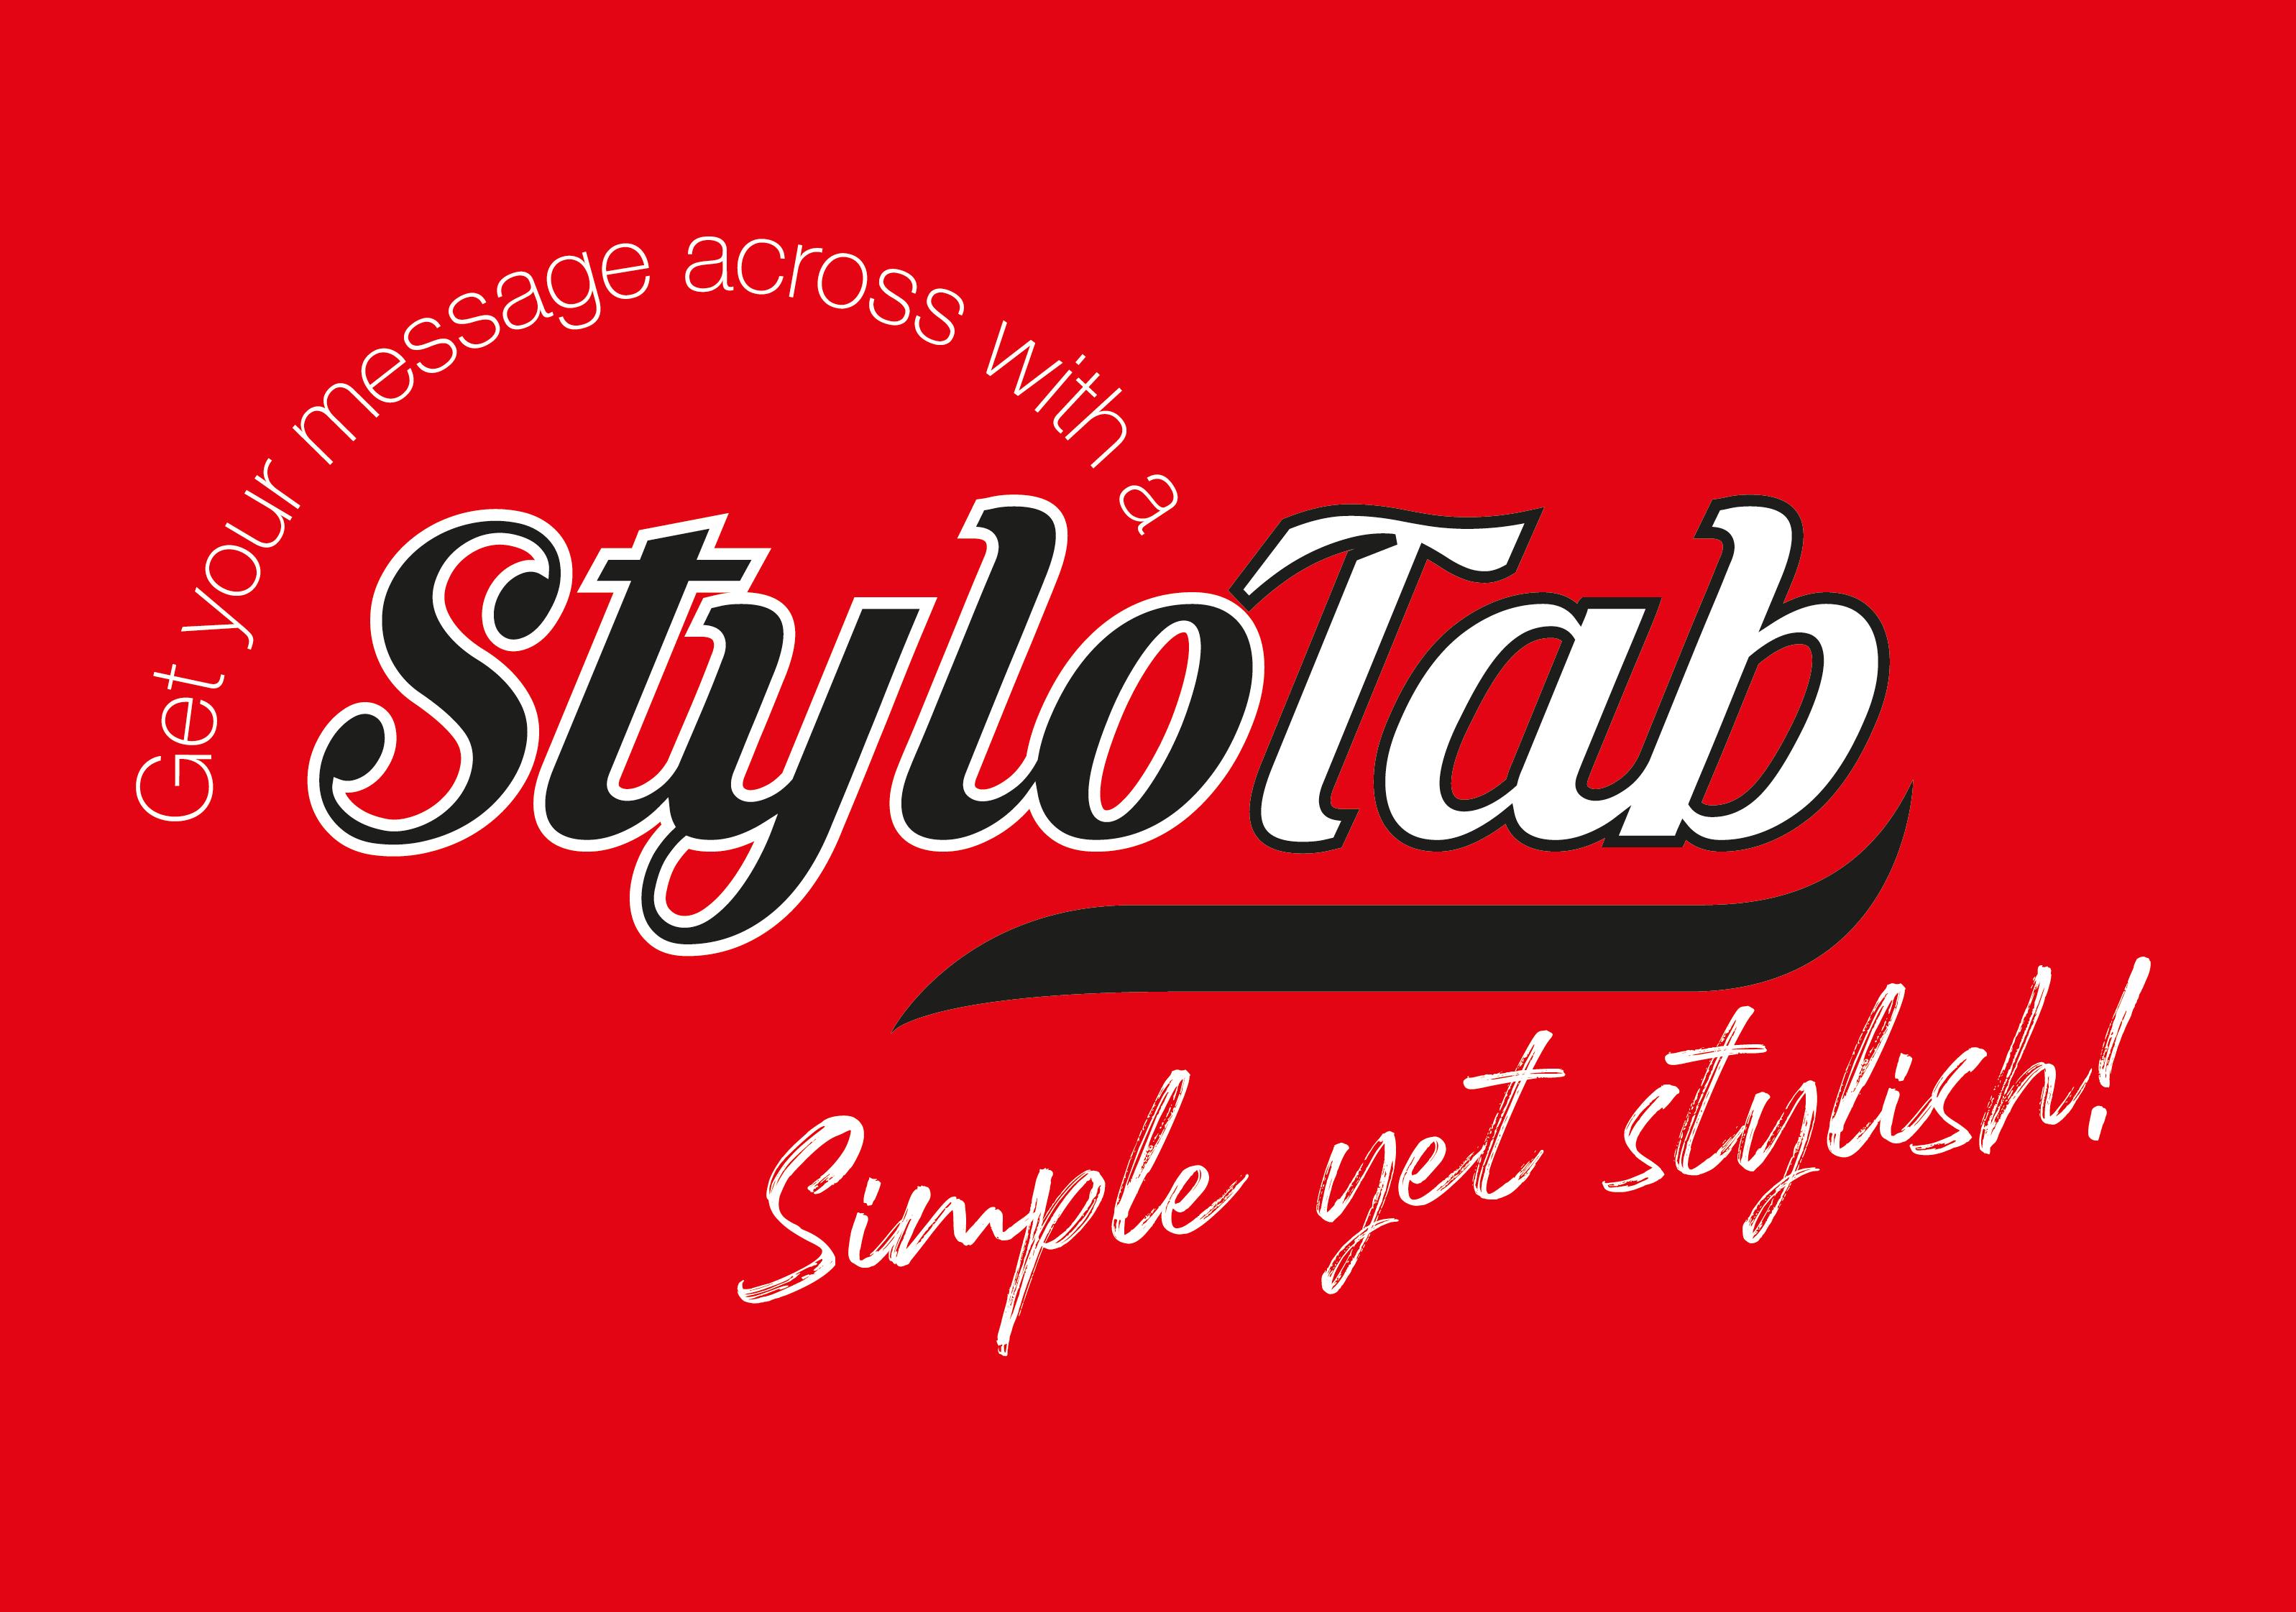 StyloTab Range